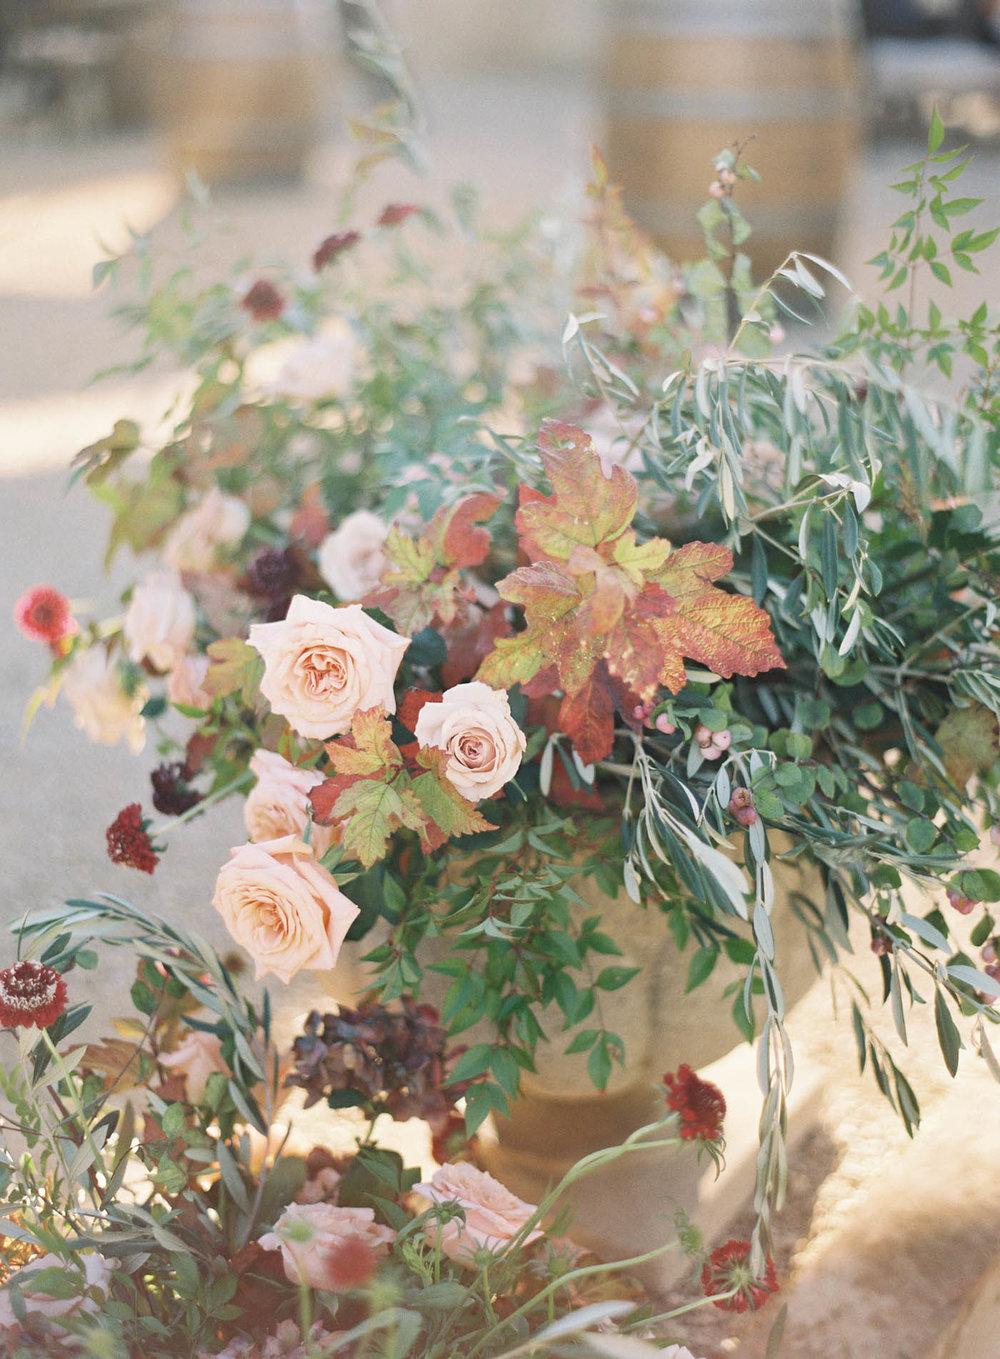 sunstone-villa-wedding-24-Jen_Huang-RD-155-Jen_Huang-009584-R1-008.jpg